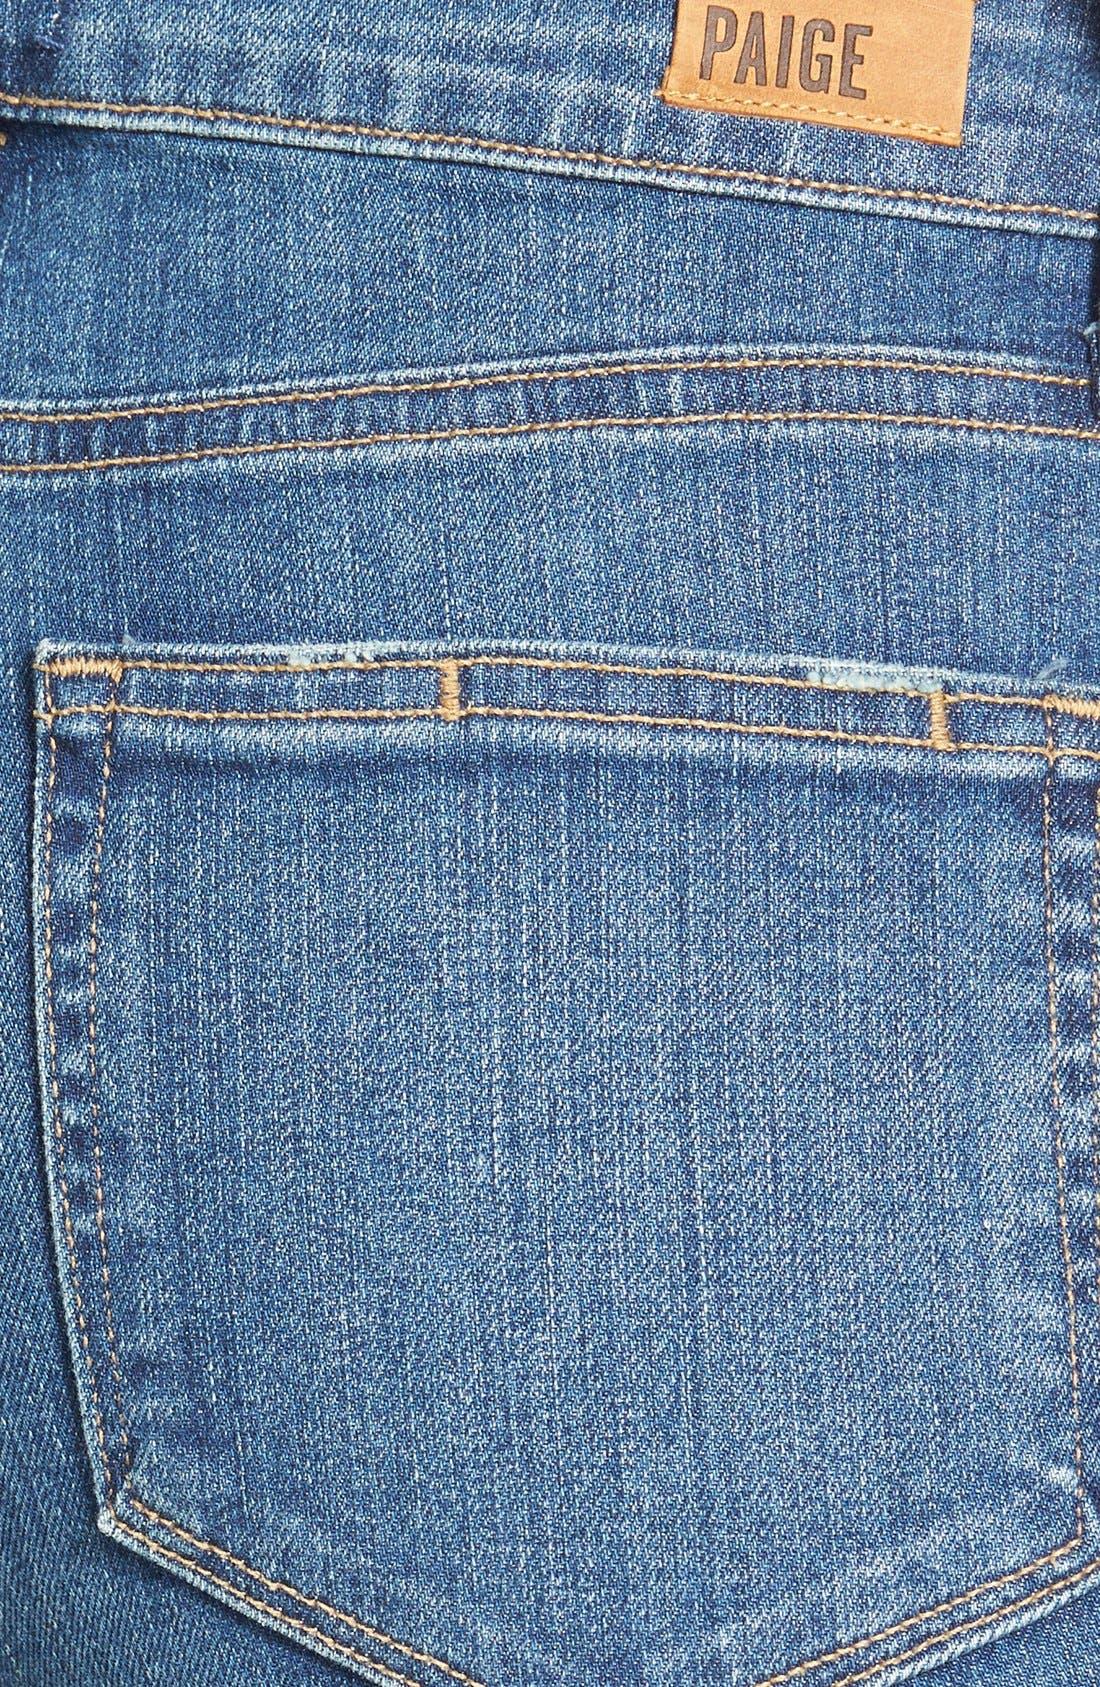 Alternate Image 3  - Paige Denim 'Margo' High Rise Ultra Skinny Jeans (Mira)